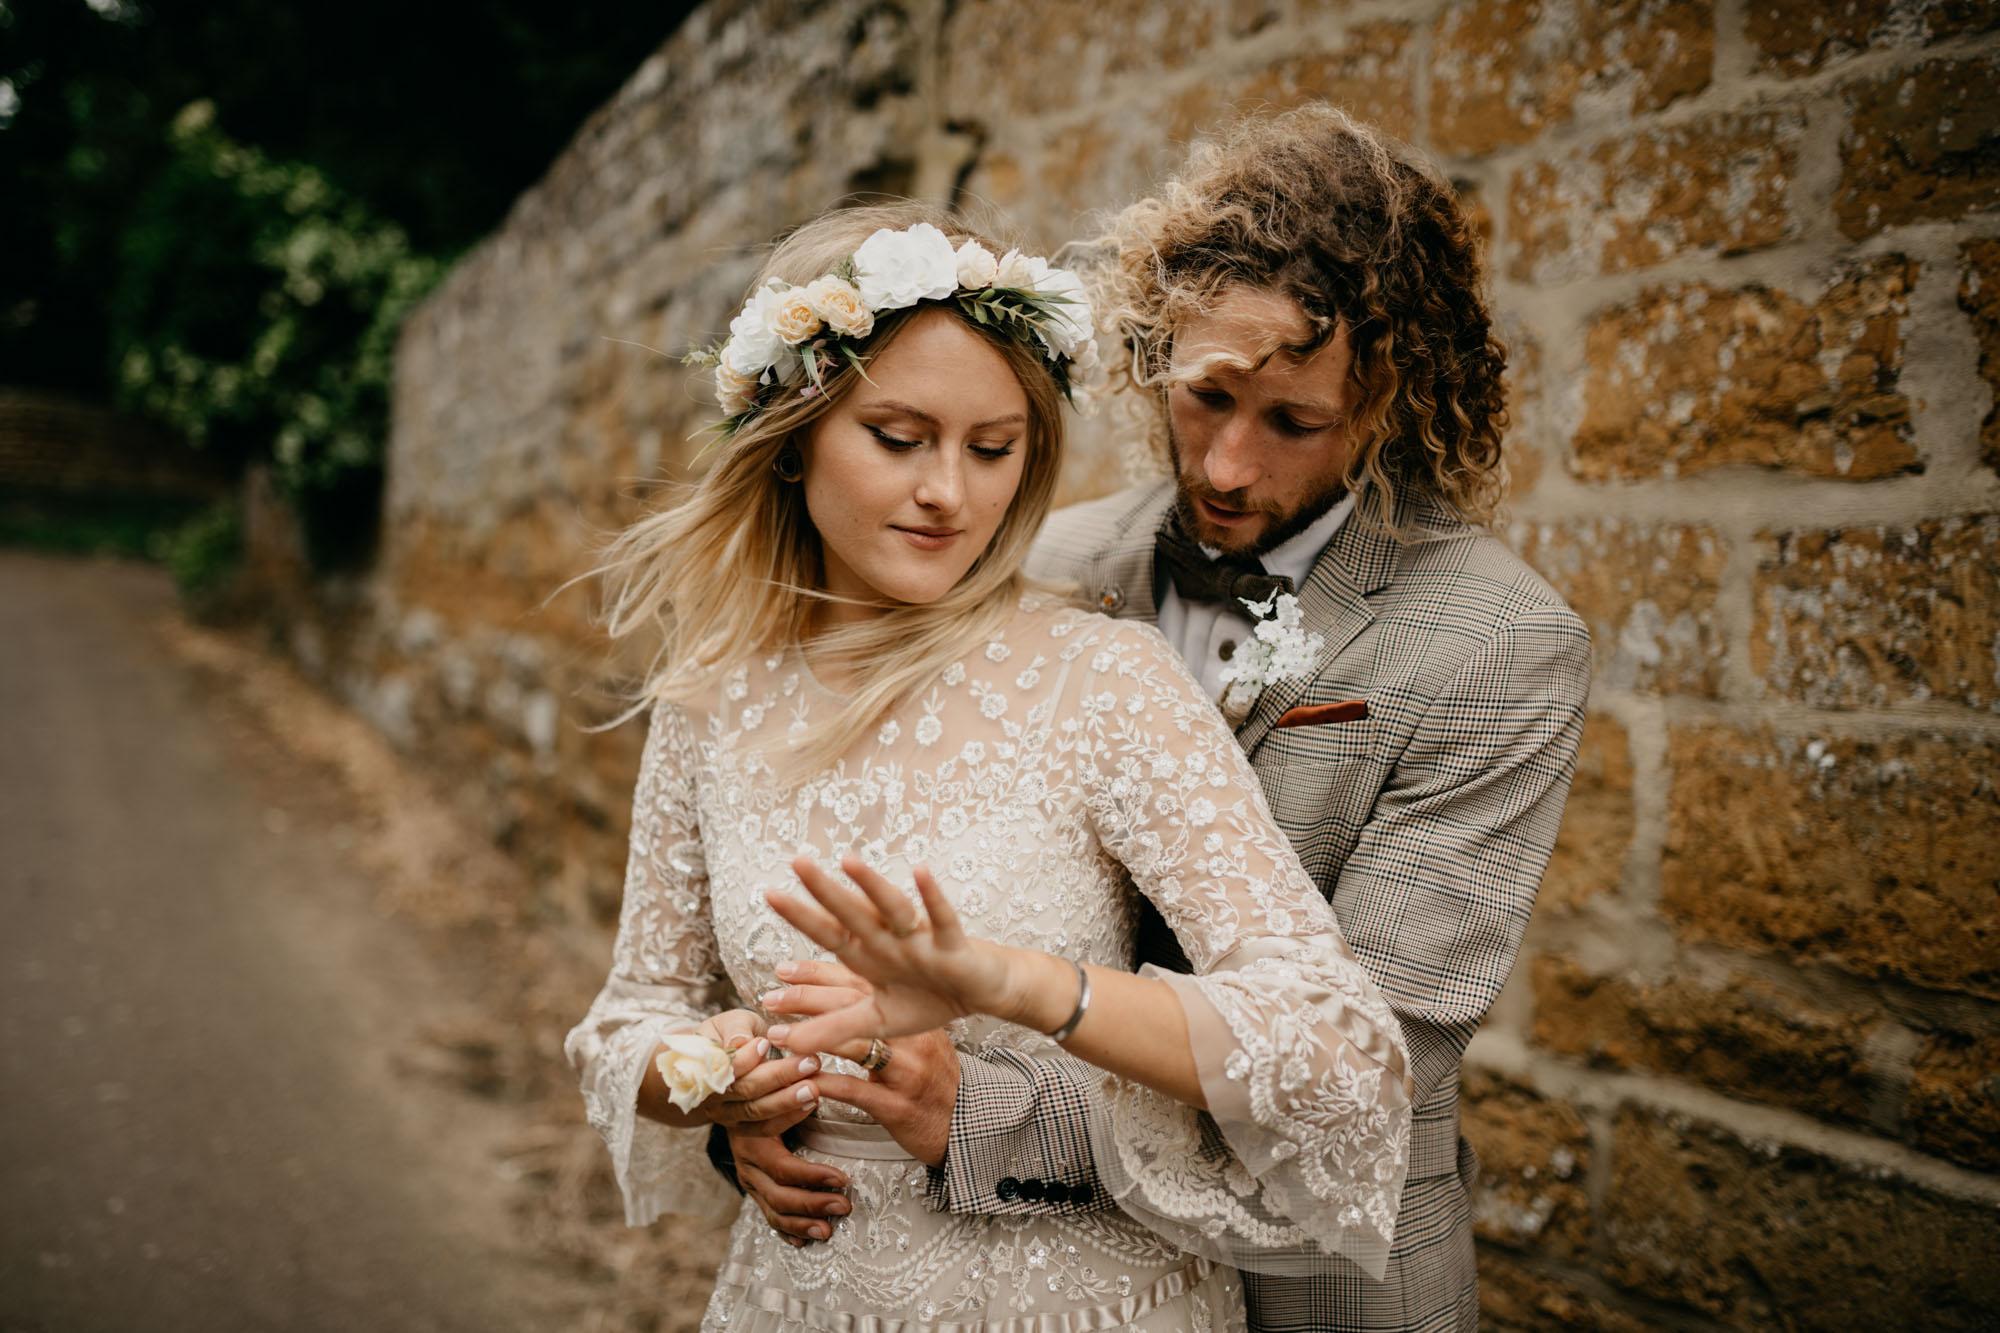 Ed Godden - Candid, Documentary Wedding Photography